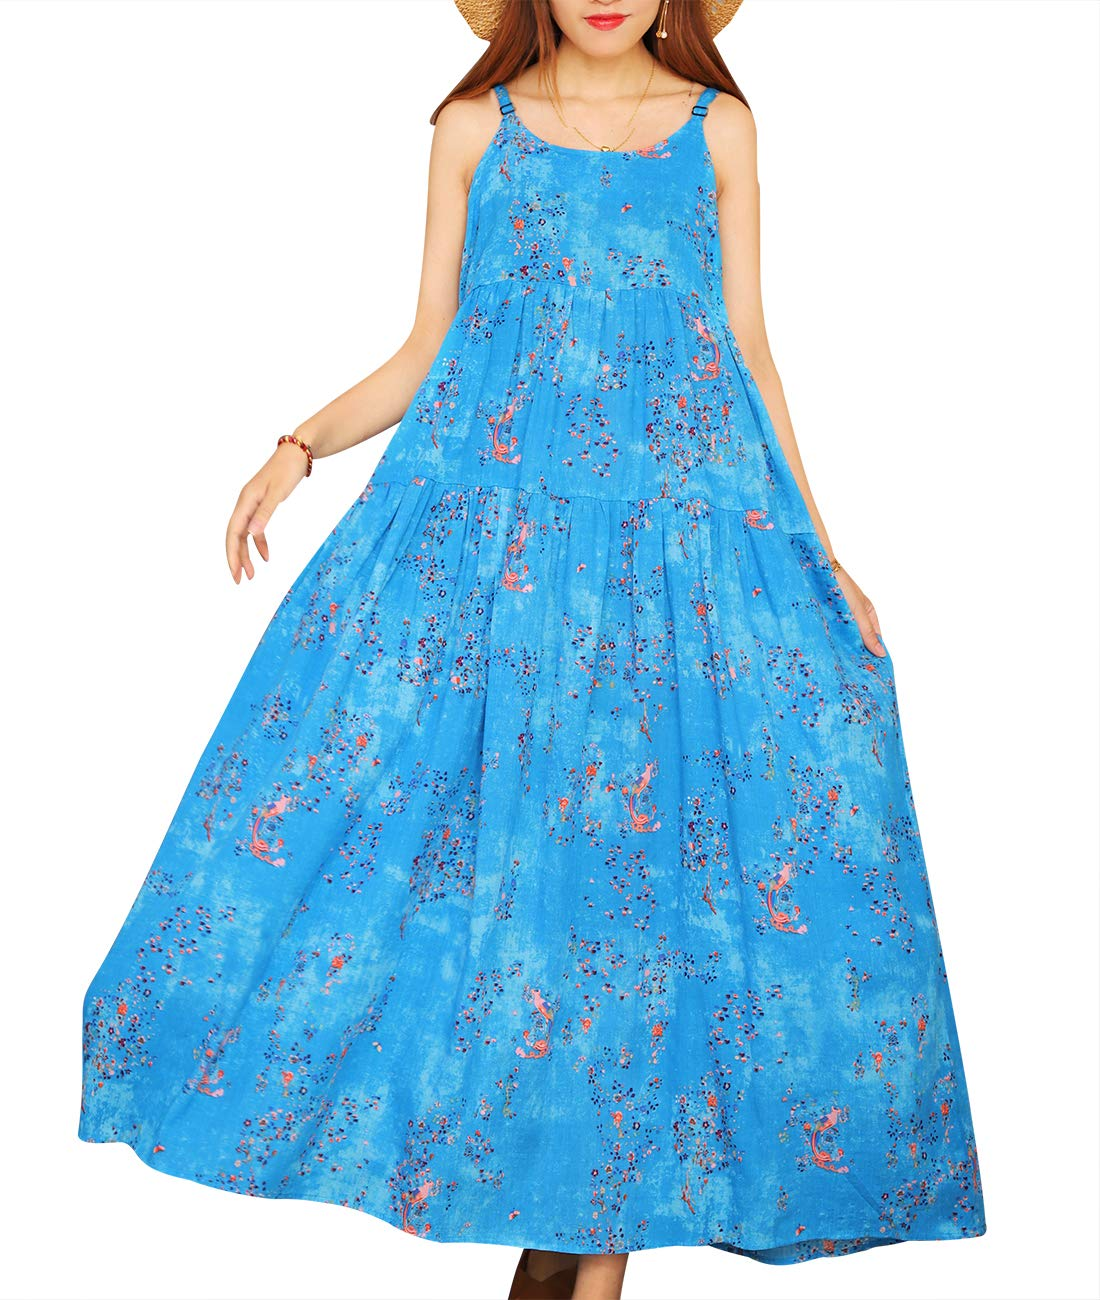 Available at Amazon: YESNO Women Casual Loose Bohemian Floral Print Empire Waist Spaghetti Strap Long Maxi Summer Beach Swing Dress XS-5X E75